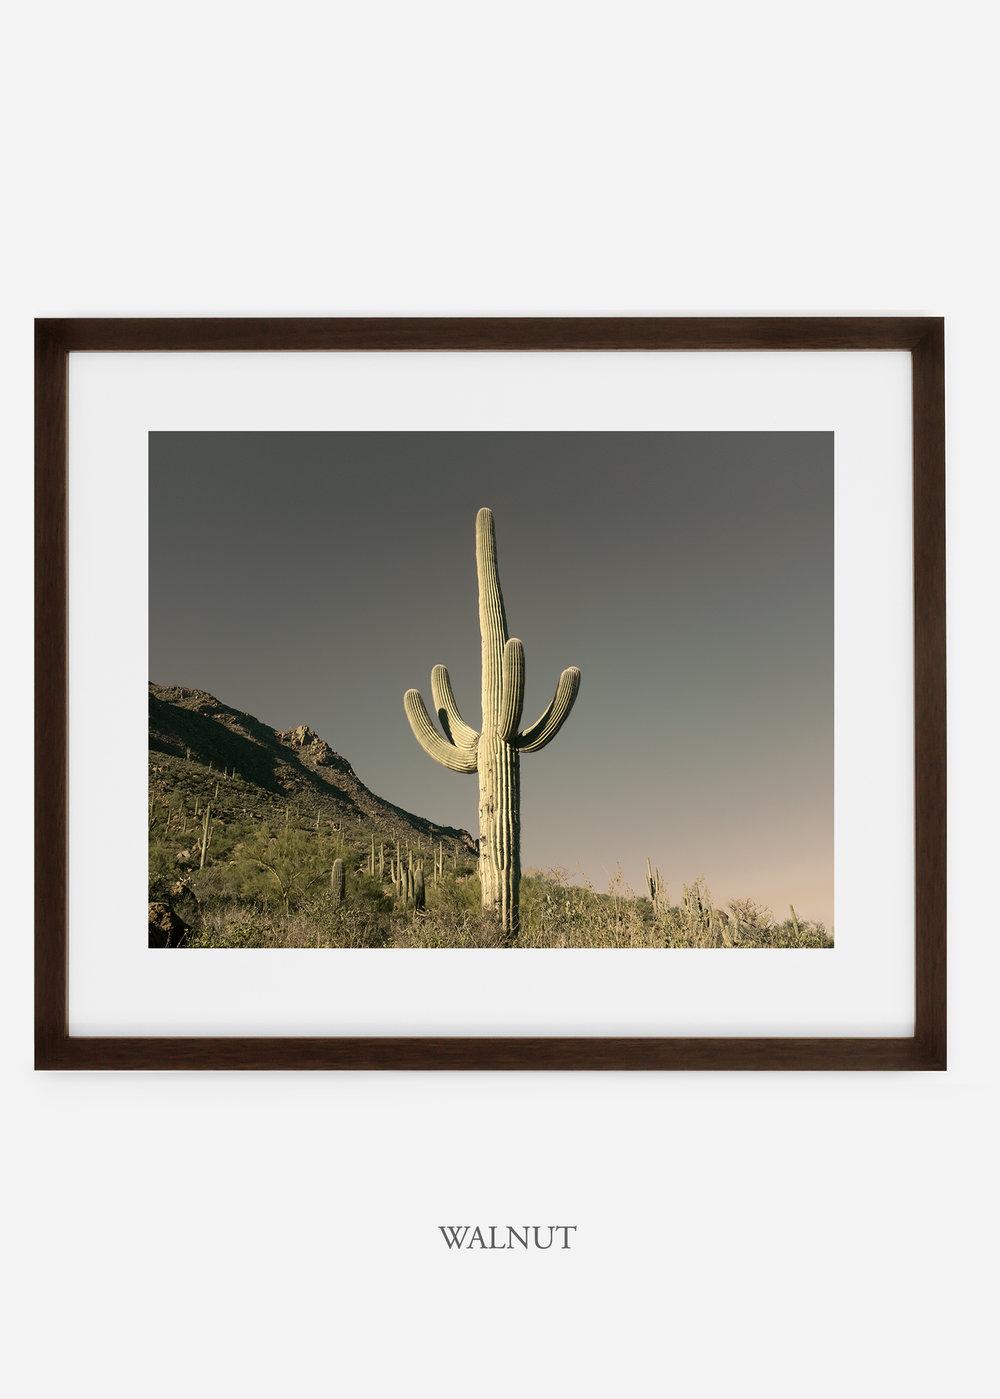 walnutframe-saguaroNo.19-wildercalifornia-art-wallart-cactusprint-homedecor-prints-arizona-botanical-artwork-interiordesign.jpg